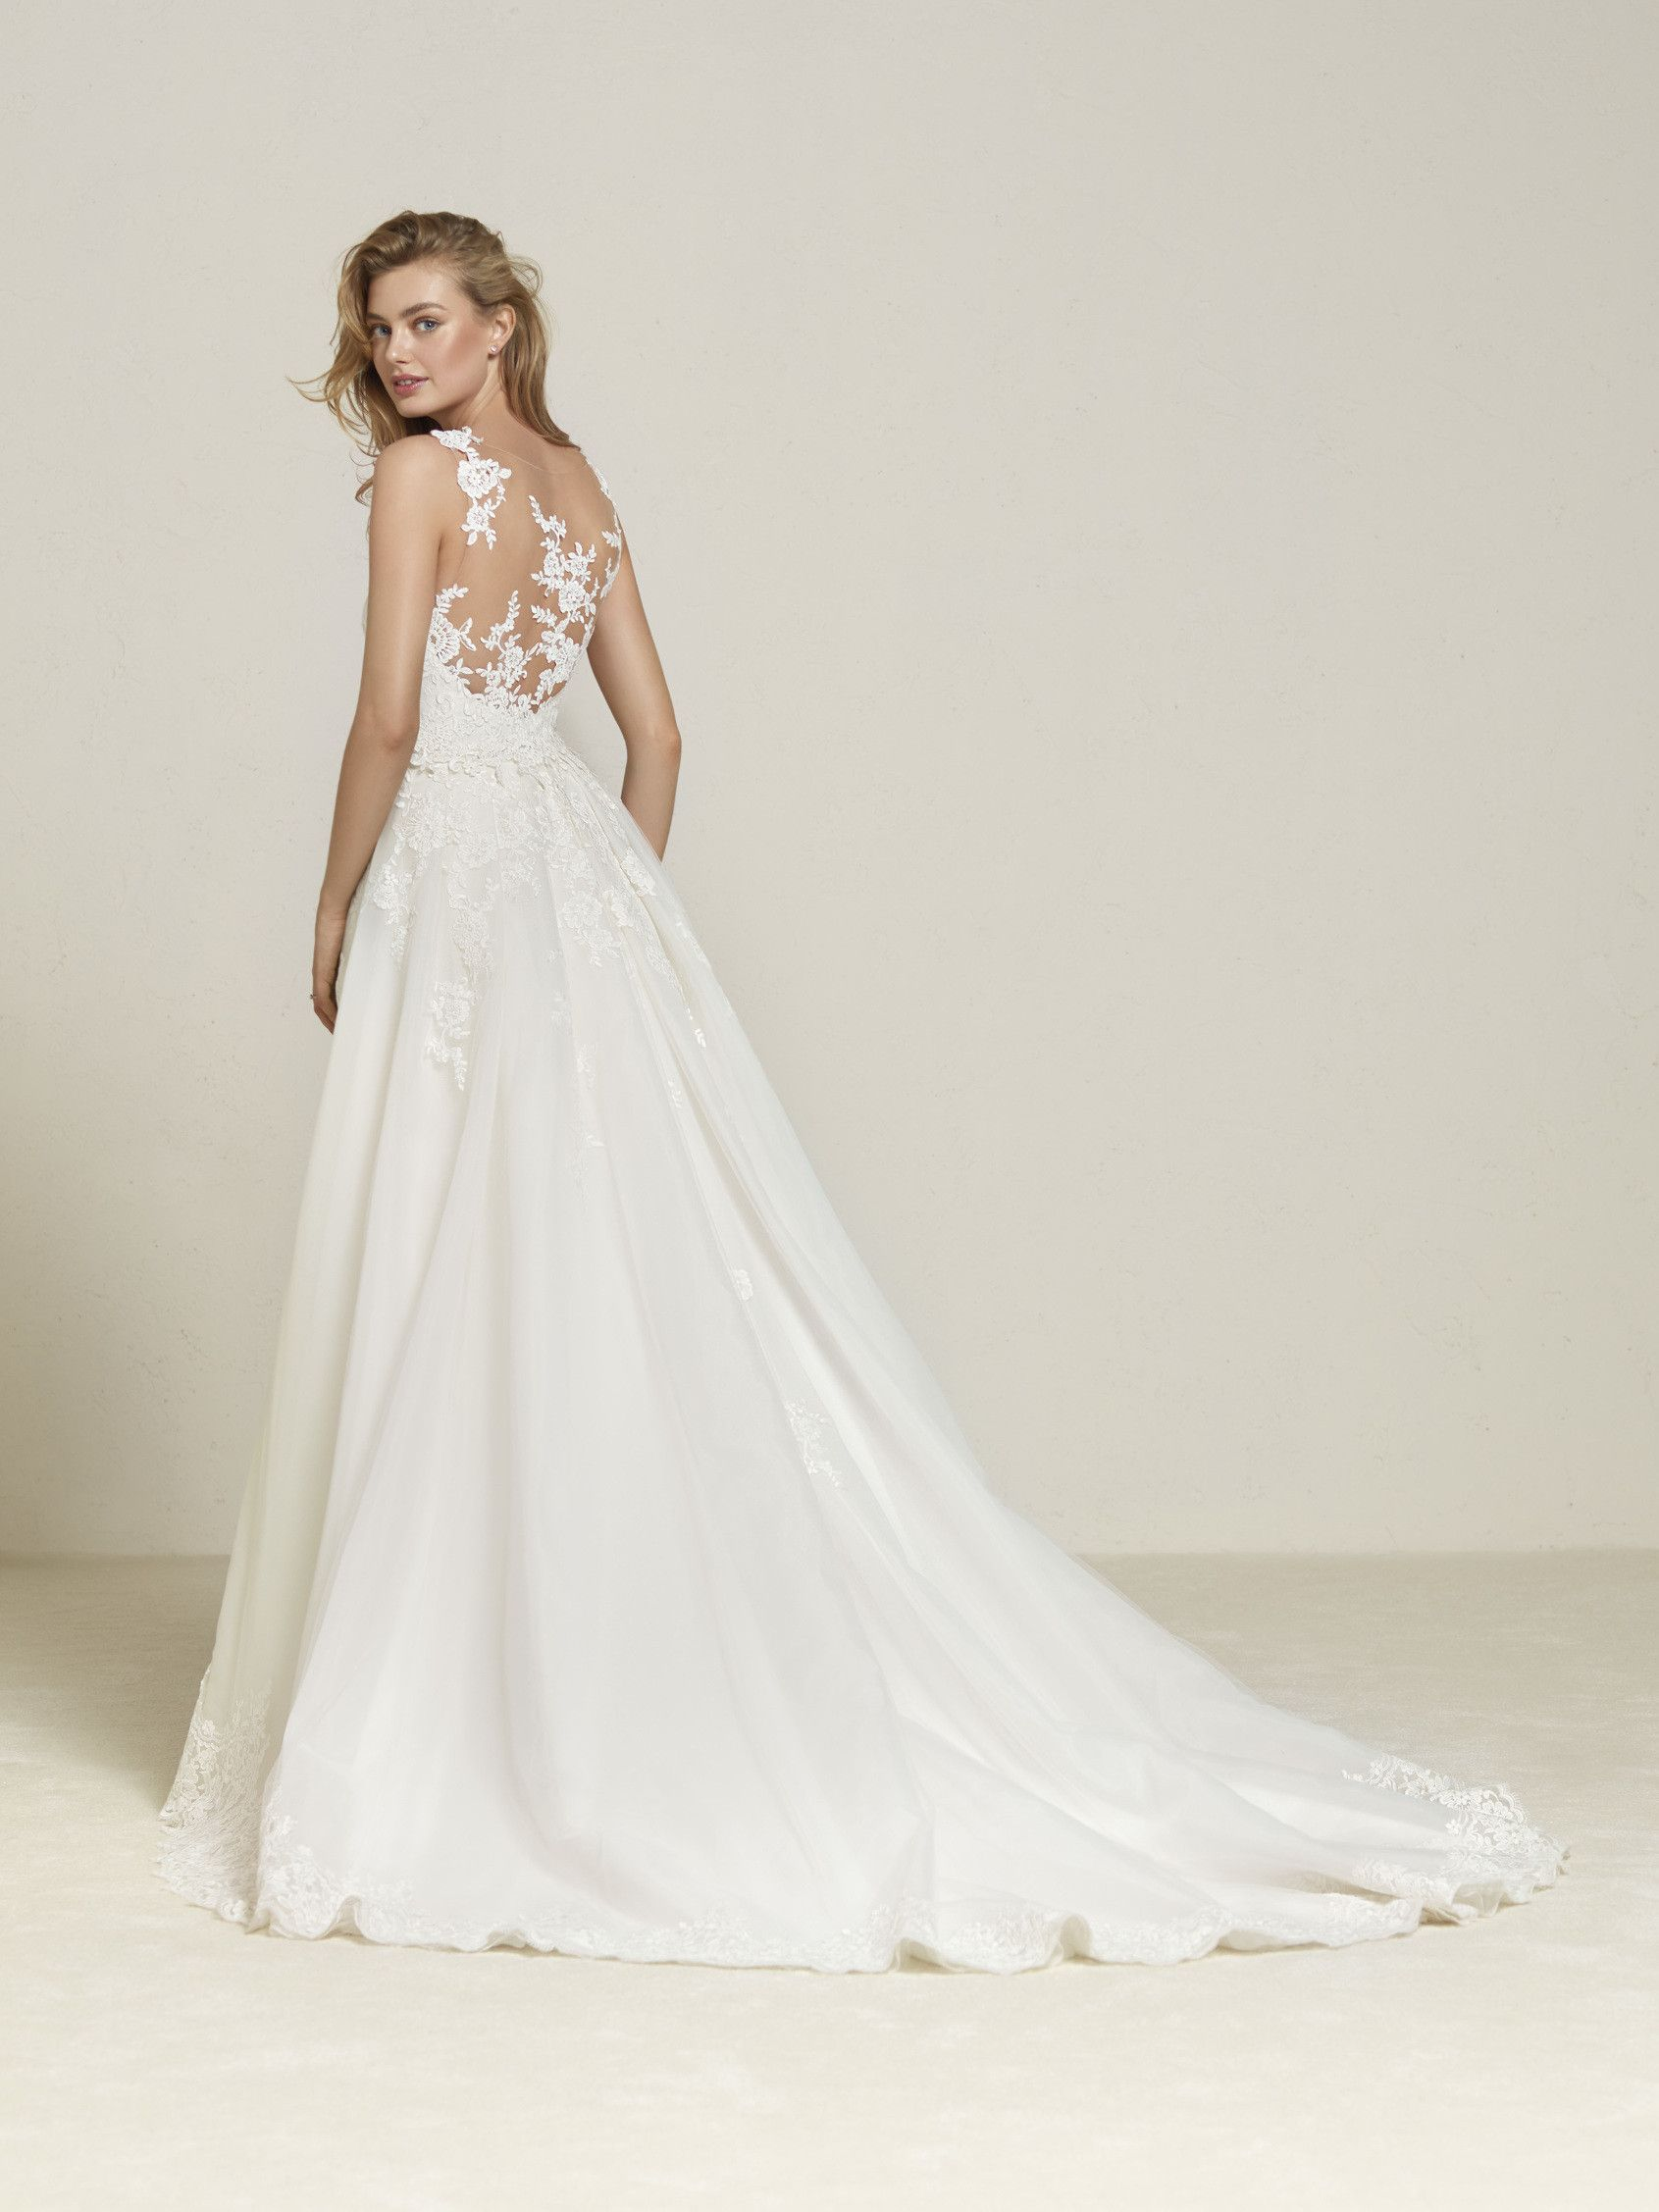 Wedding dress with detachable overskirt